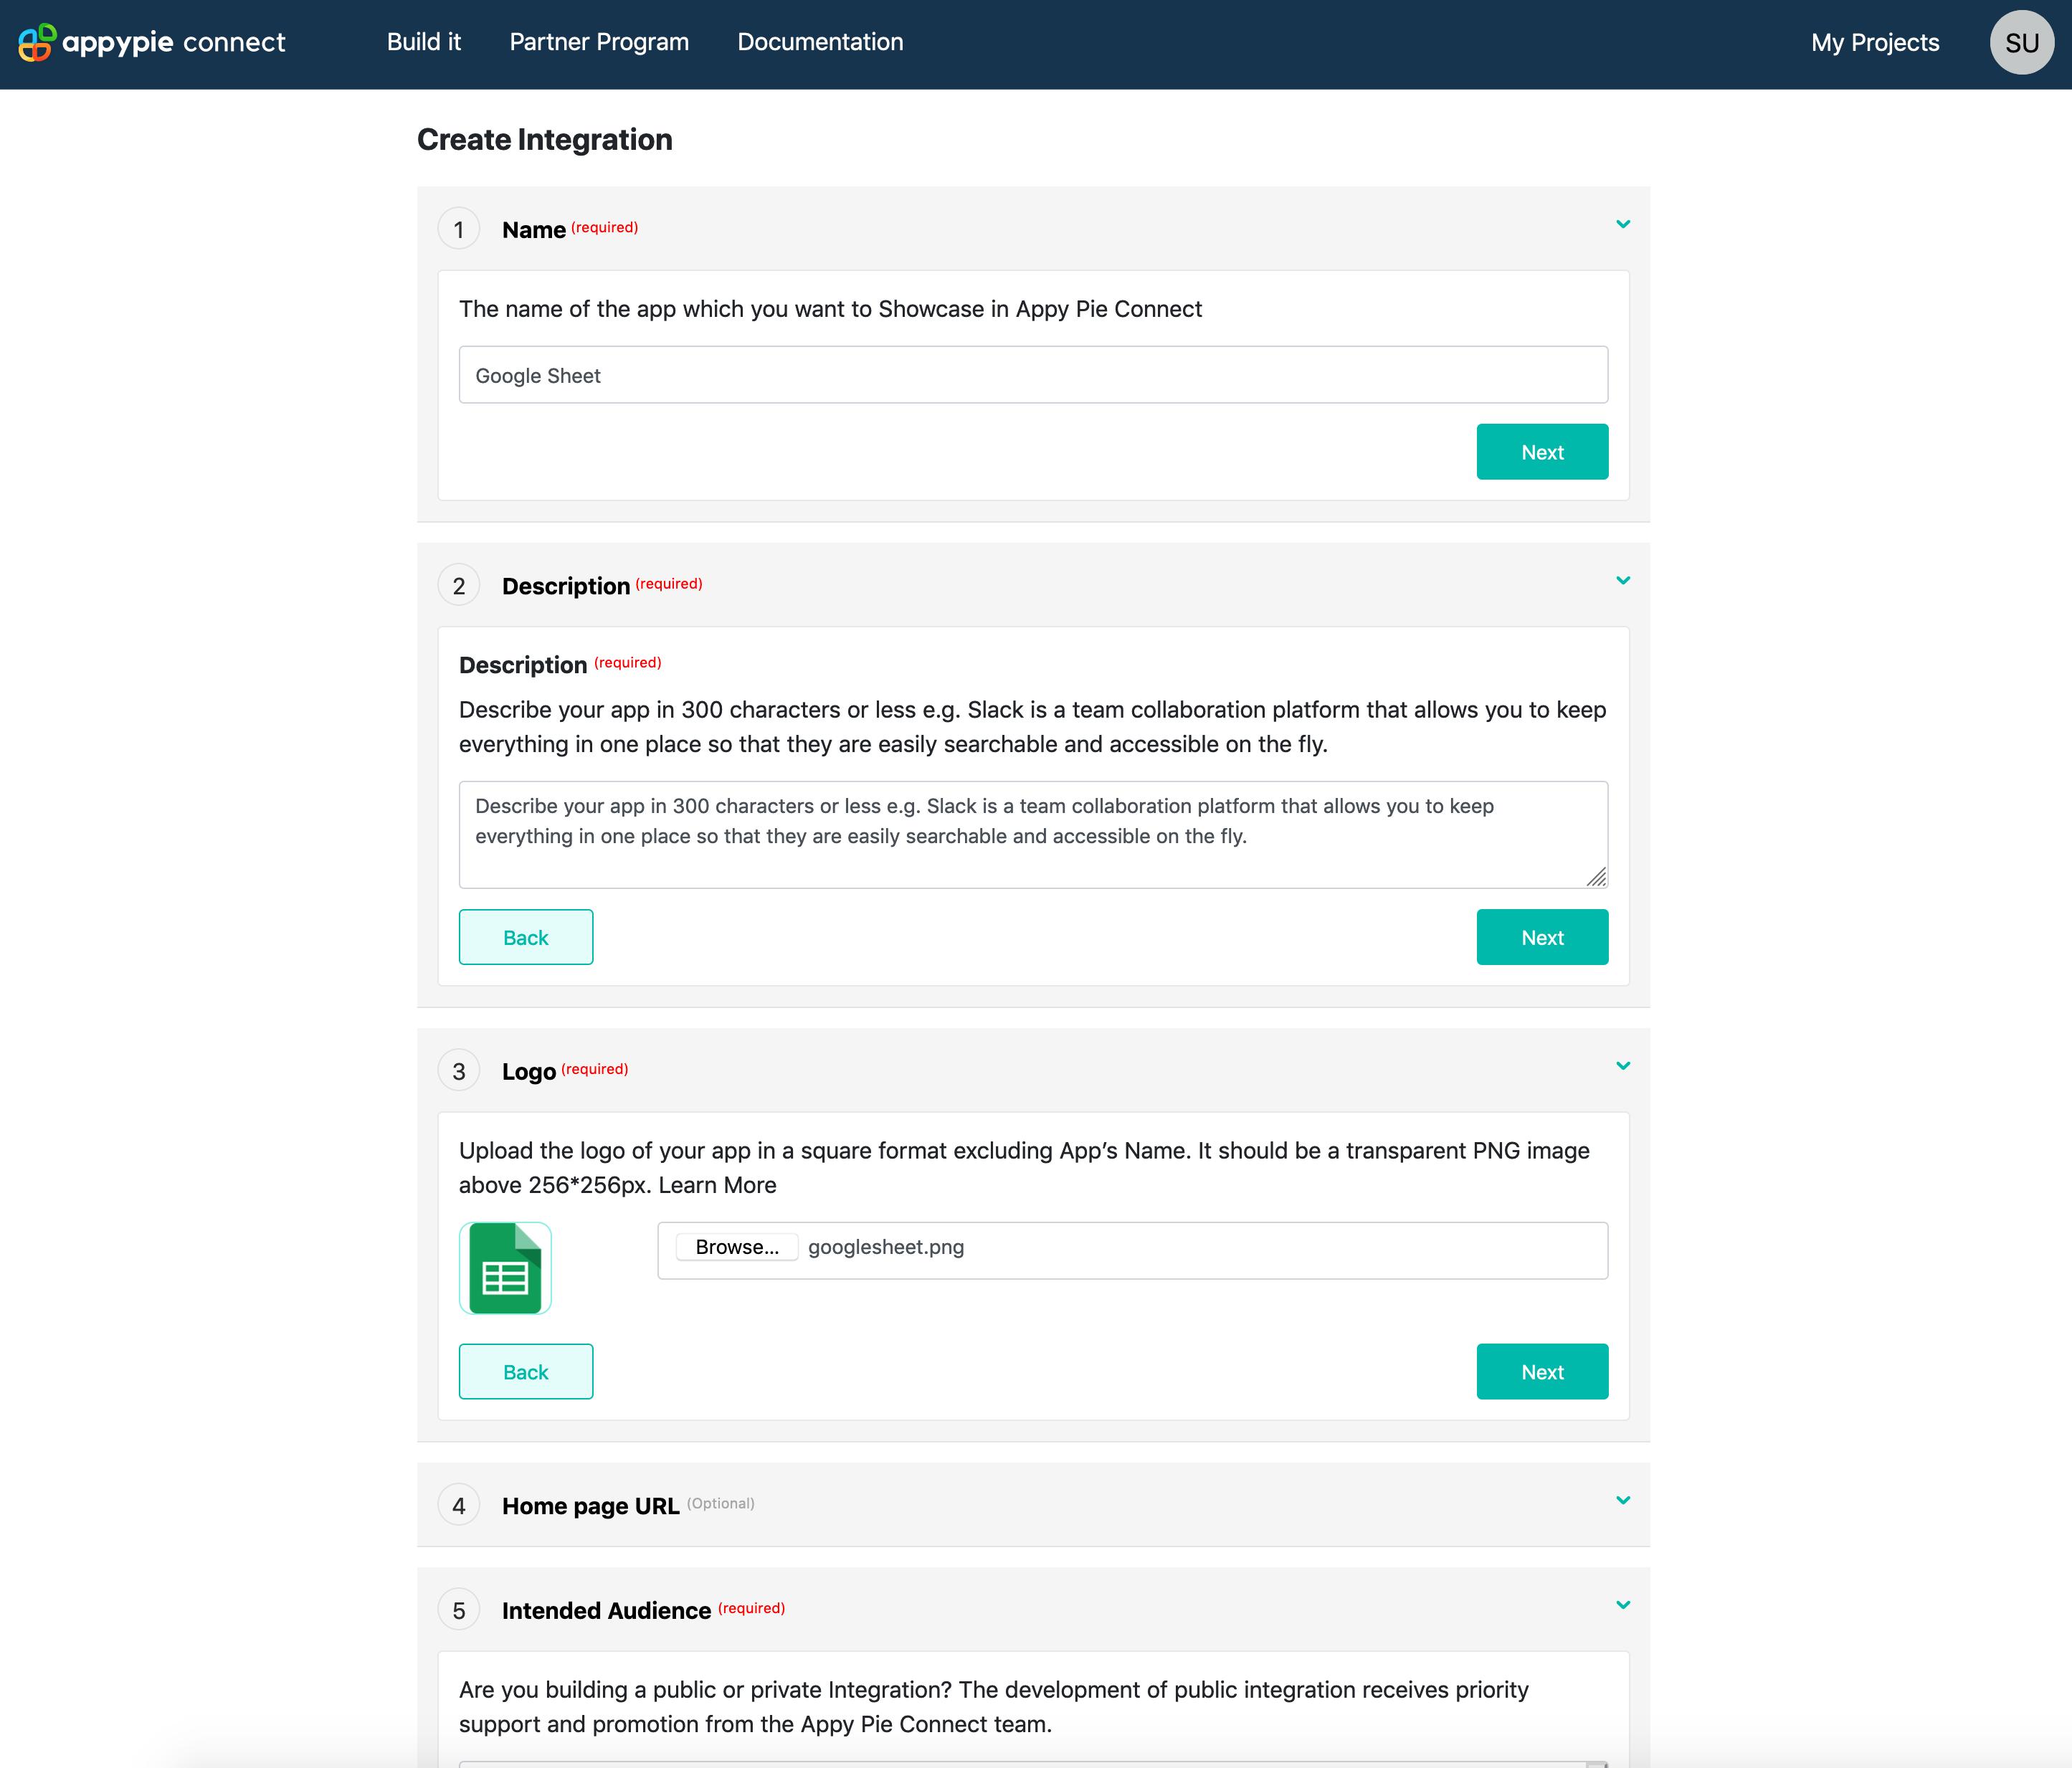 Create Integration Page Appy Pie Connect developer | AUTOMATION